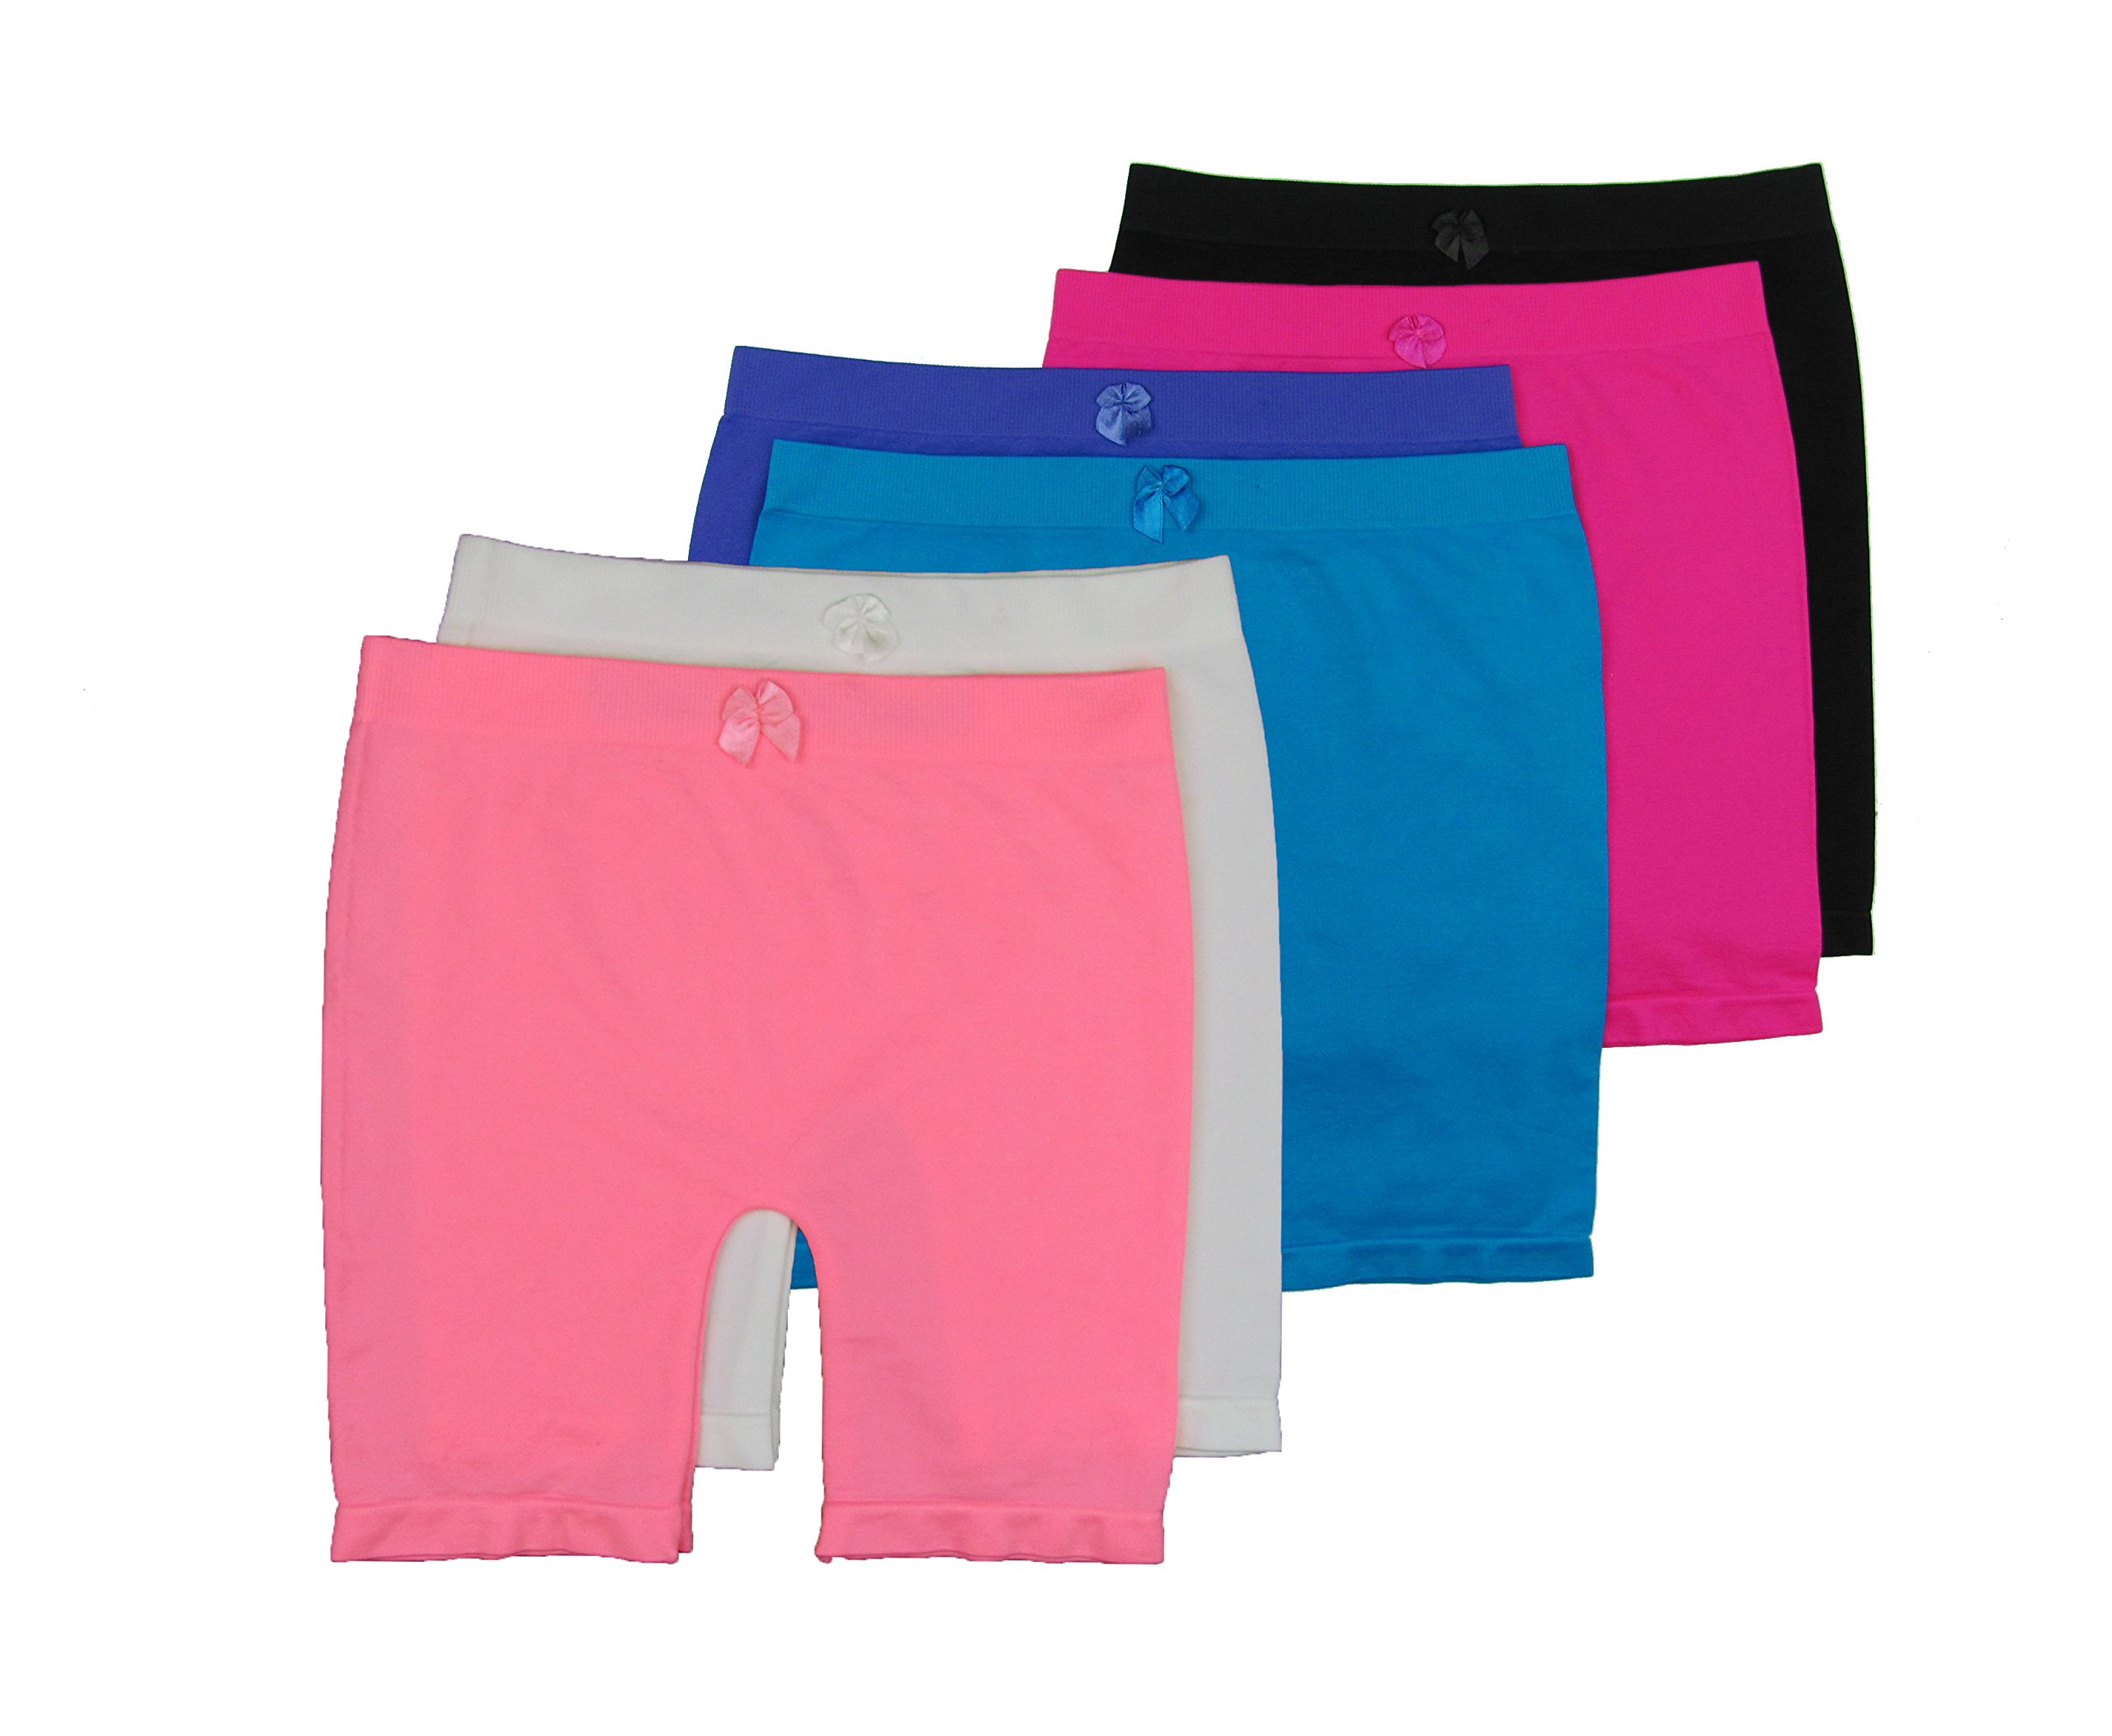 Sophia Girls Short Leggings (6pc) (Medium (8-11 yrs), Black, Hot Pink, Purple, Blue, White, Pink)